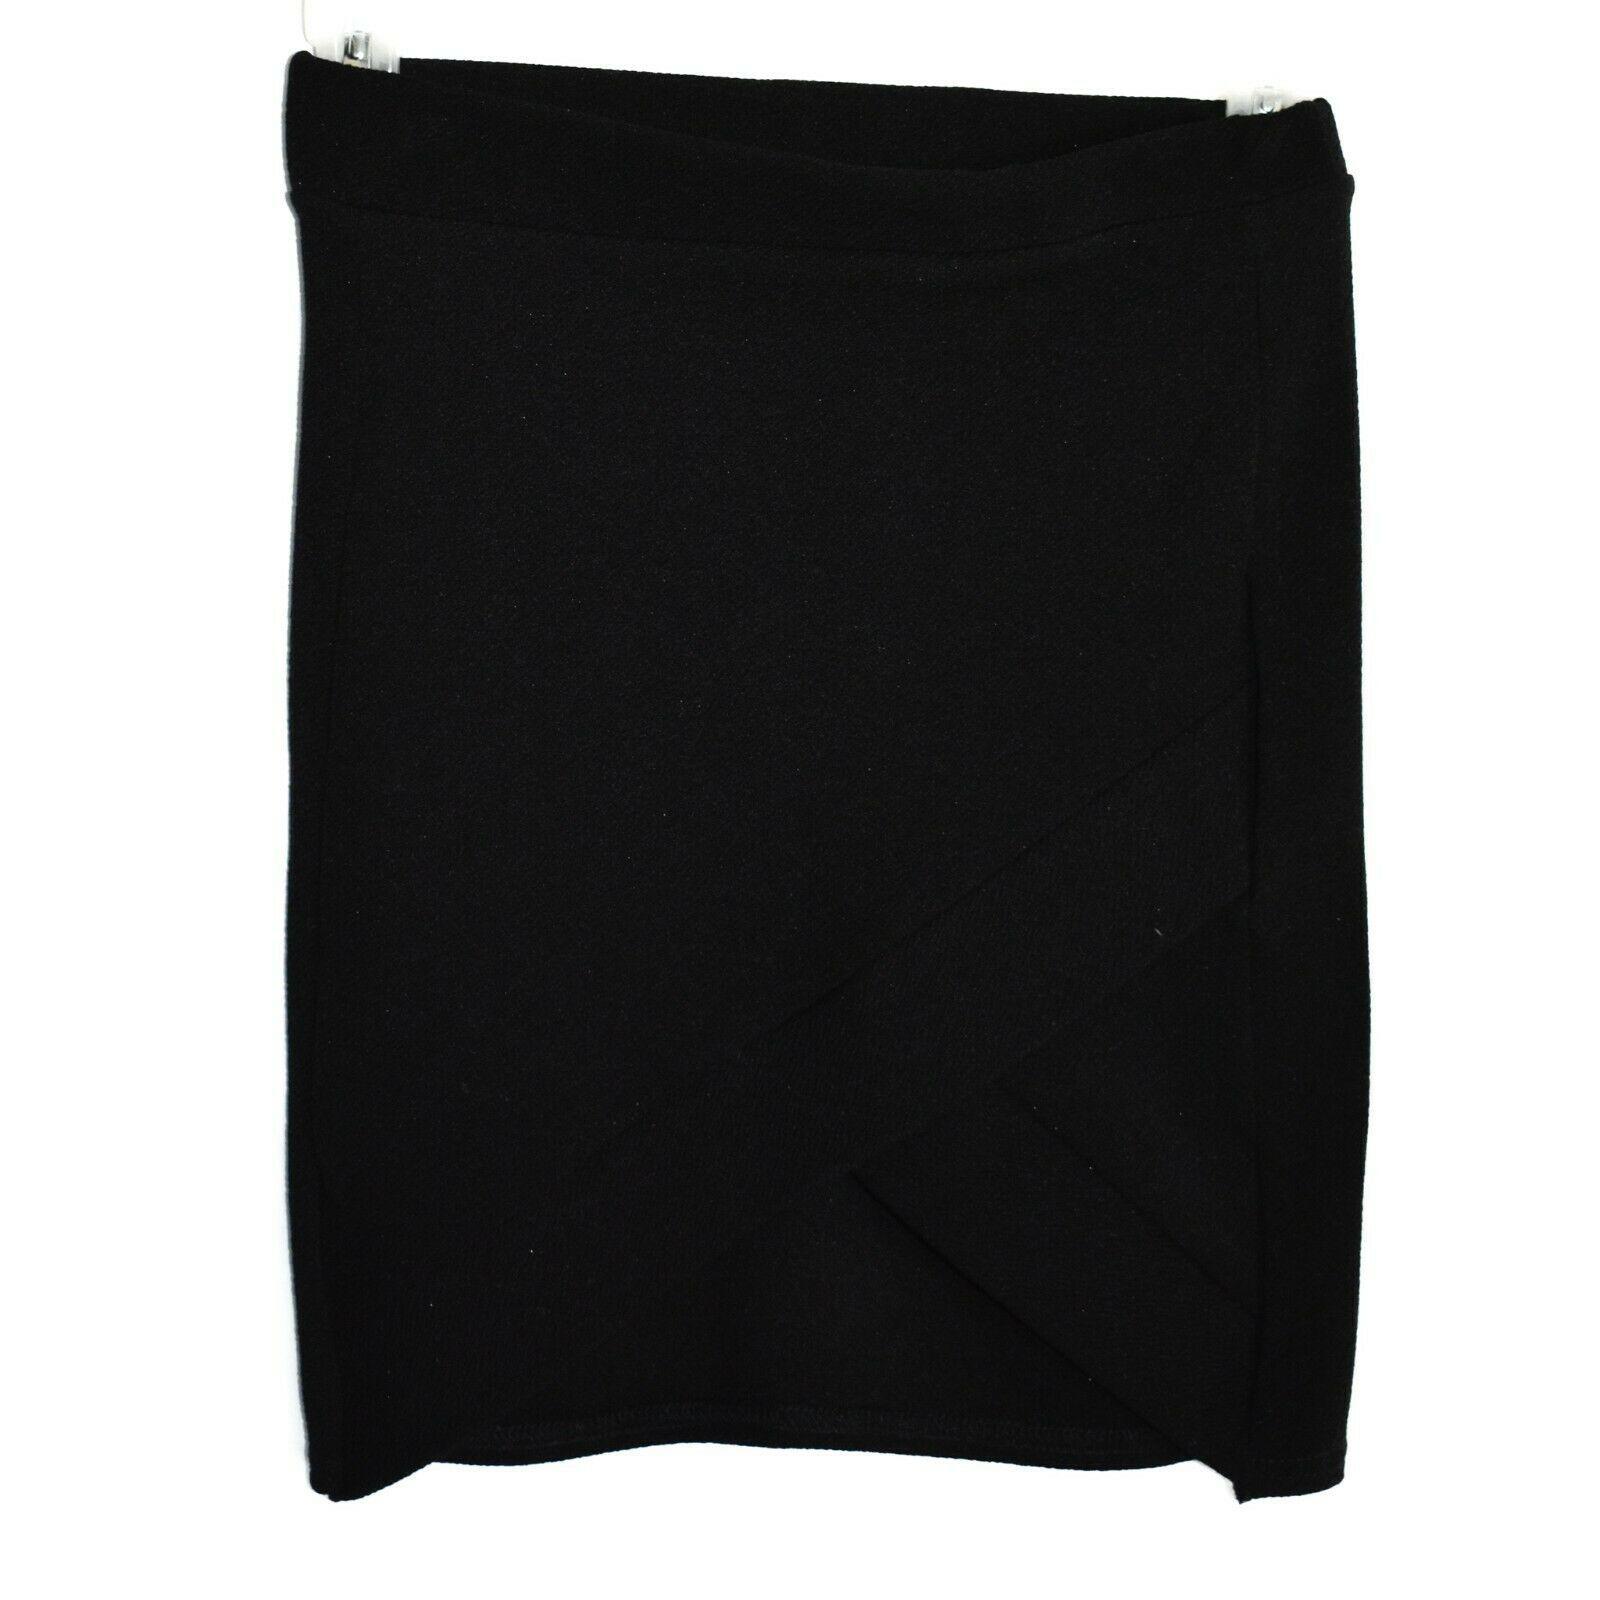 Pretty Little Thing Black Mini Skirt US 4 | UK 8 | EU FR 36 | EU DE 34